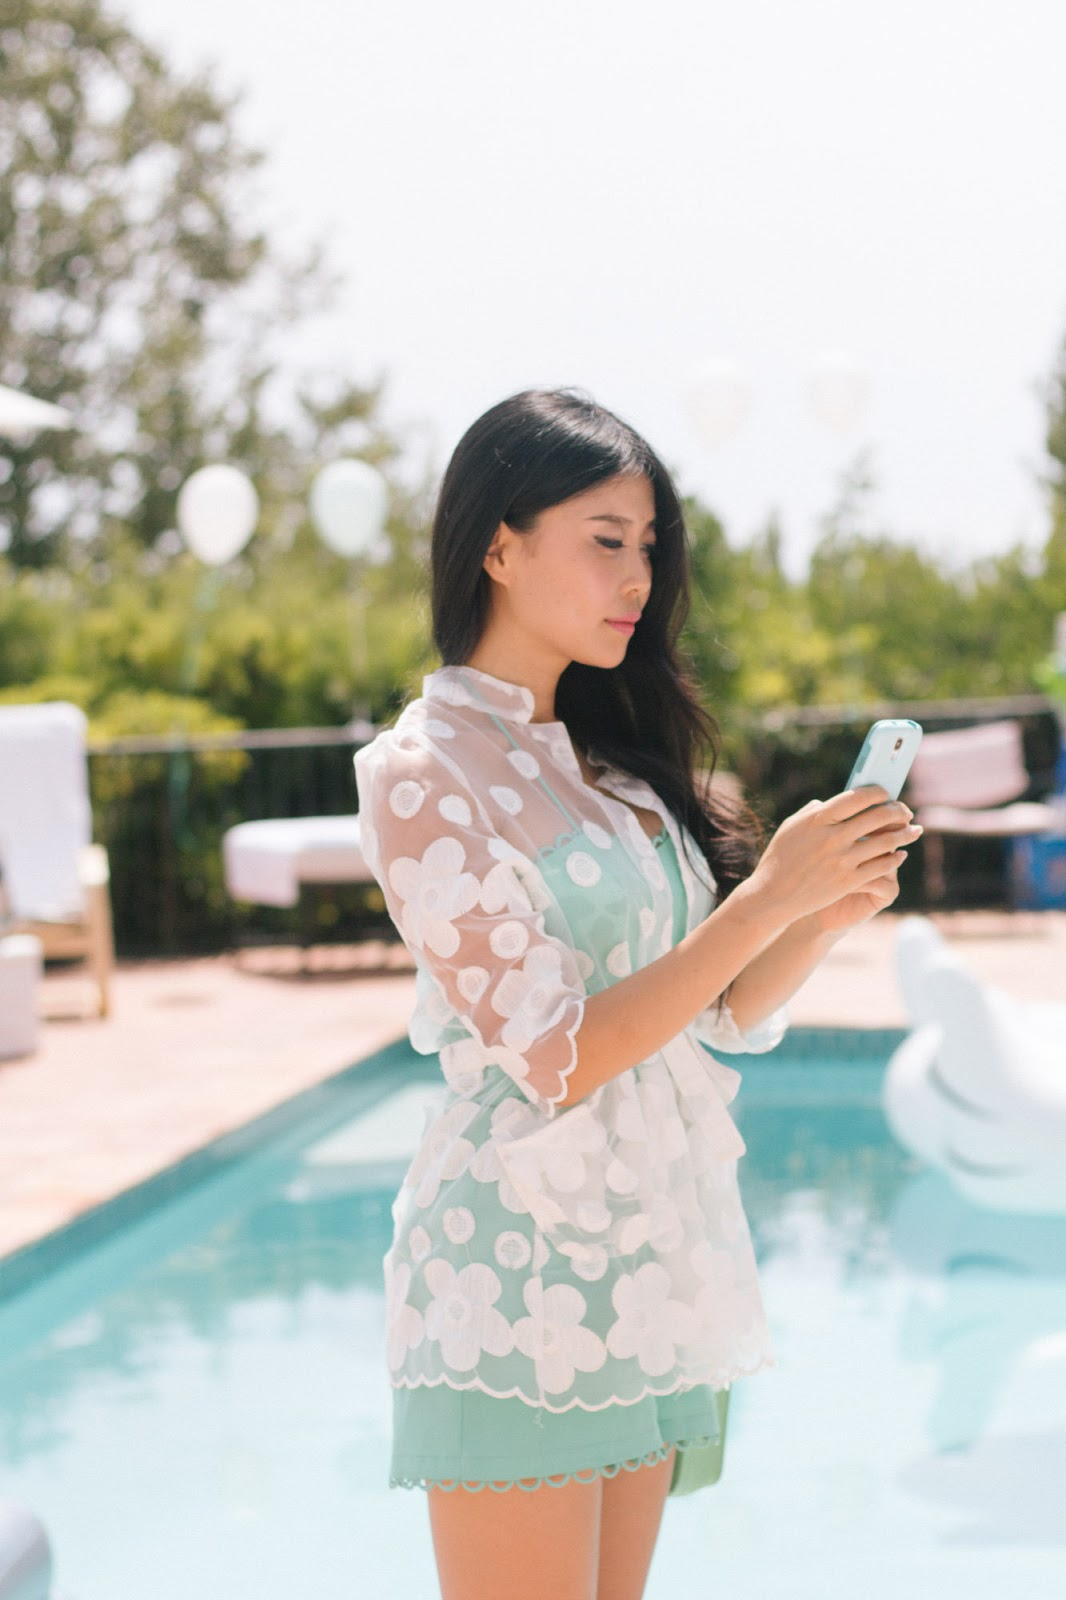 LA asian american fashion style beauty blogger